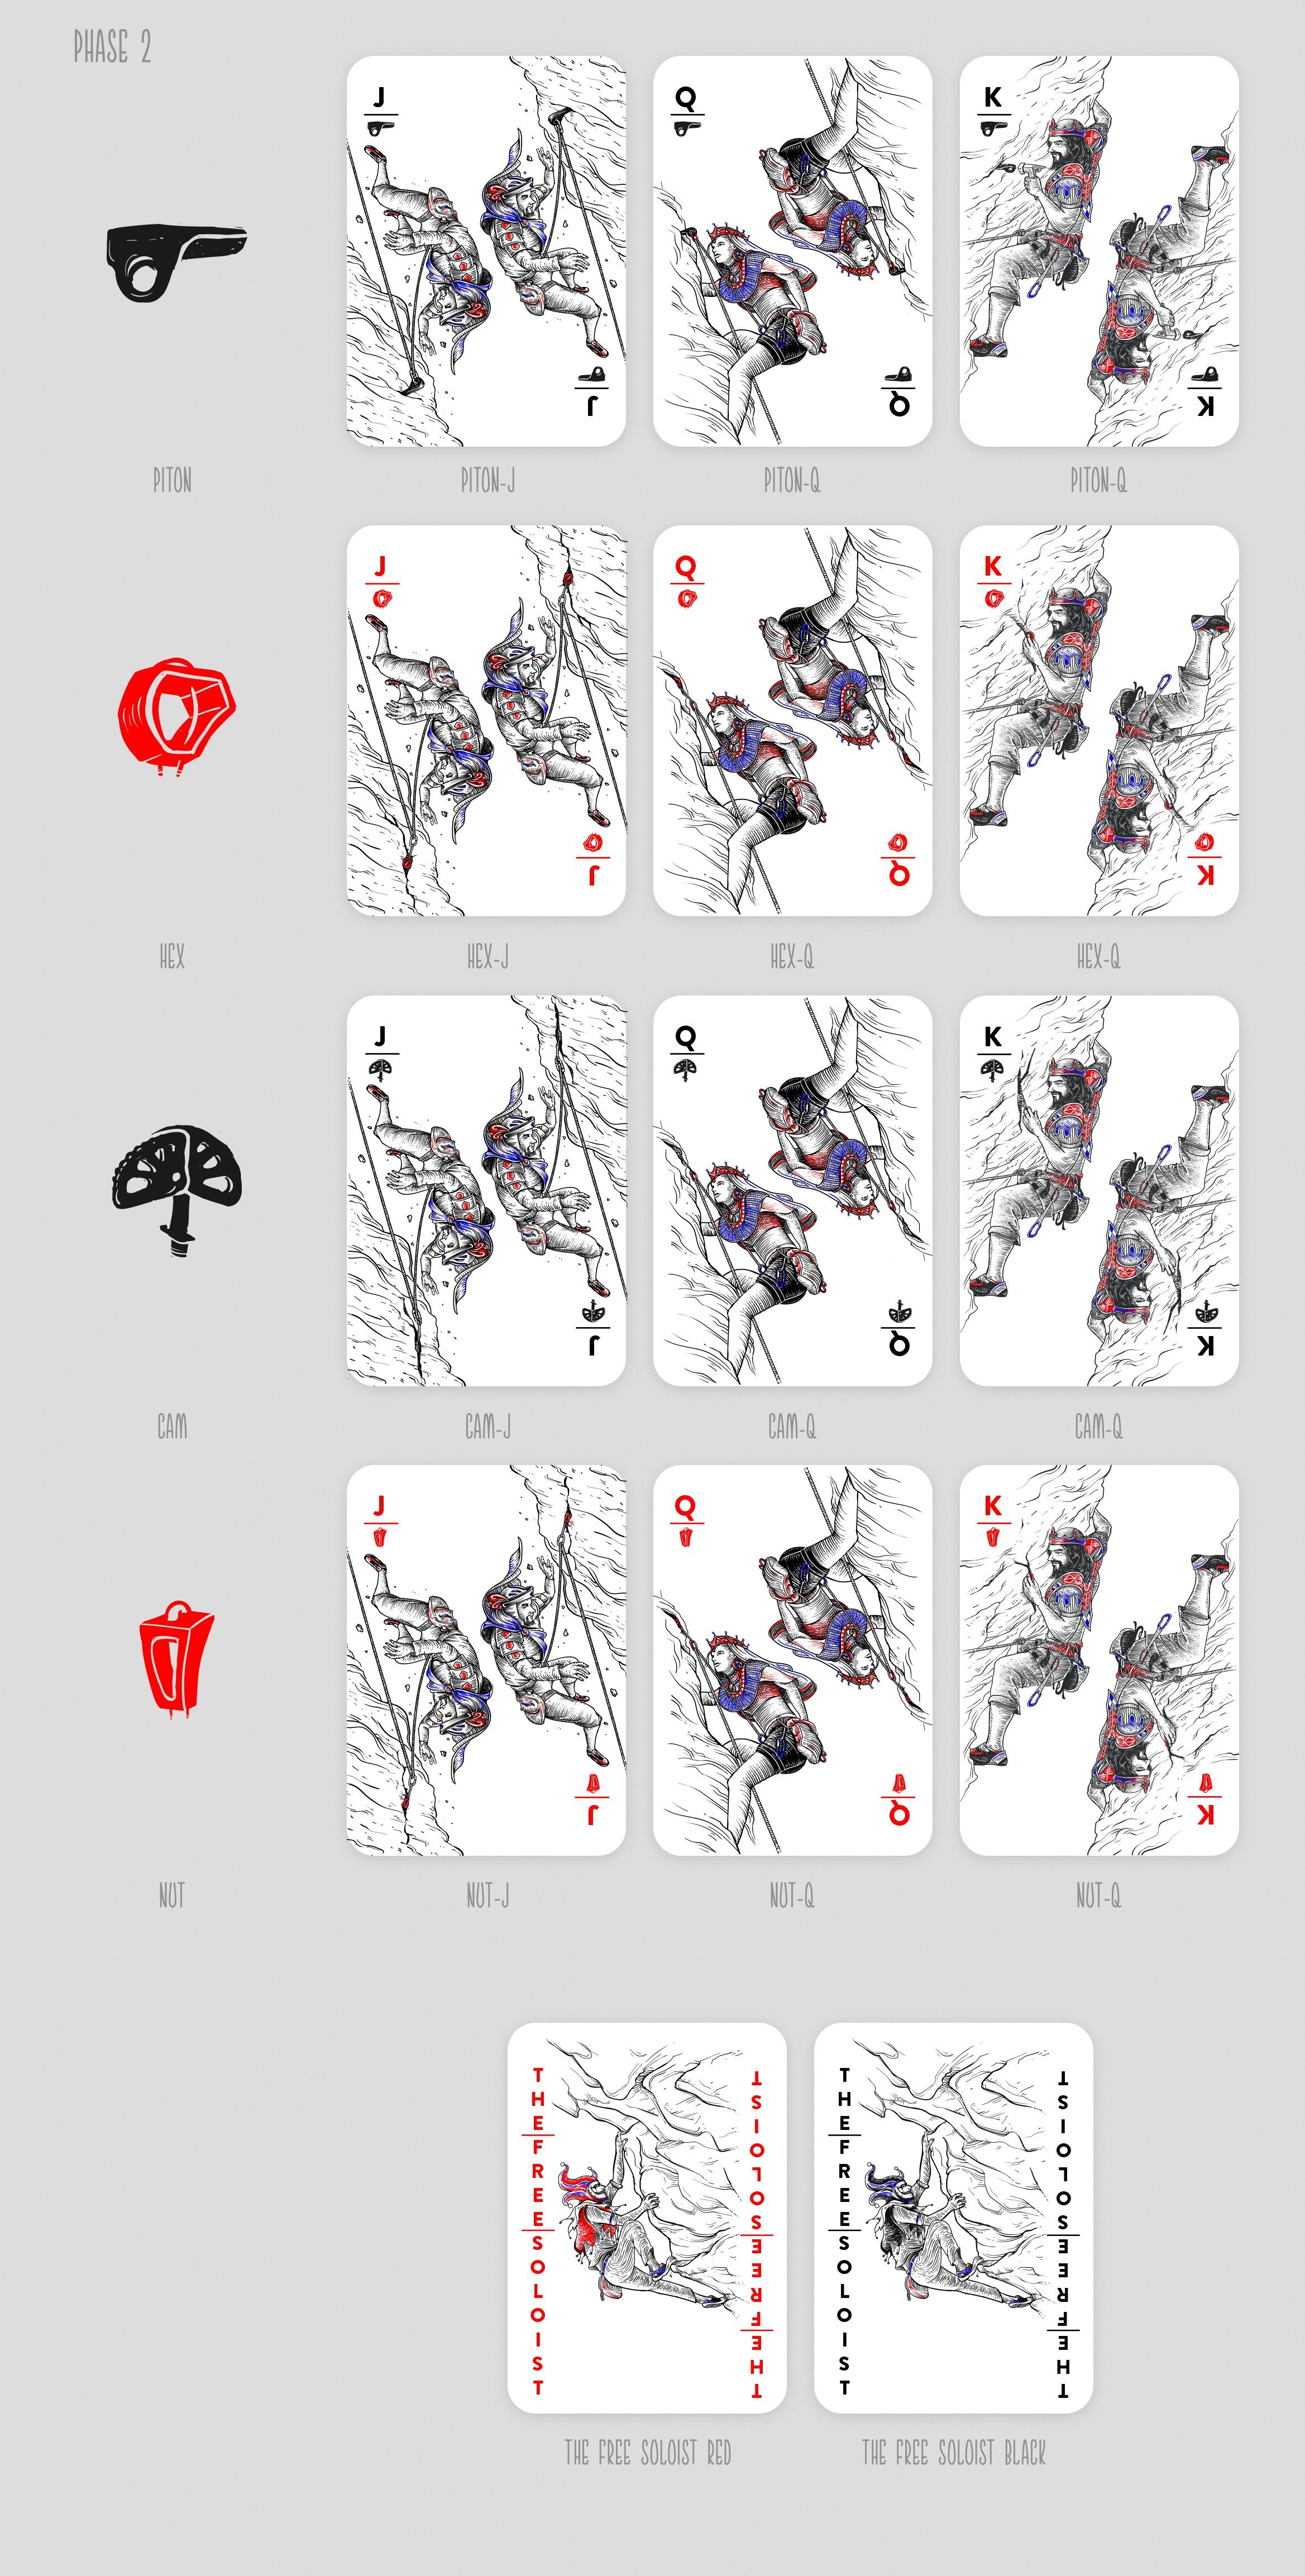 Mtn. Cards